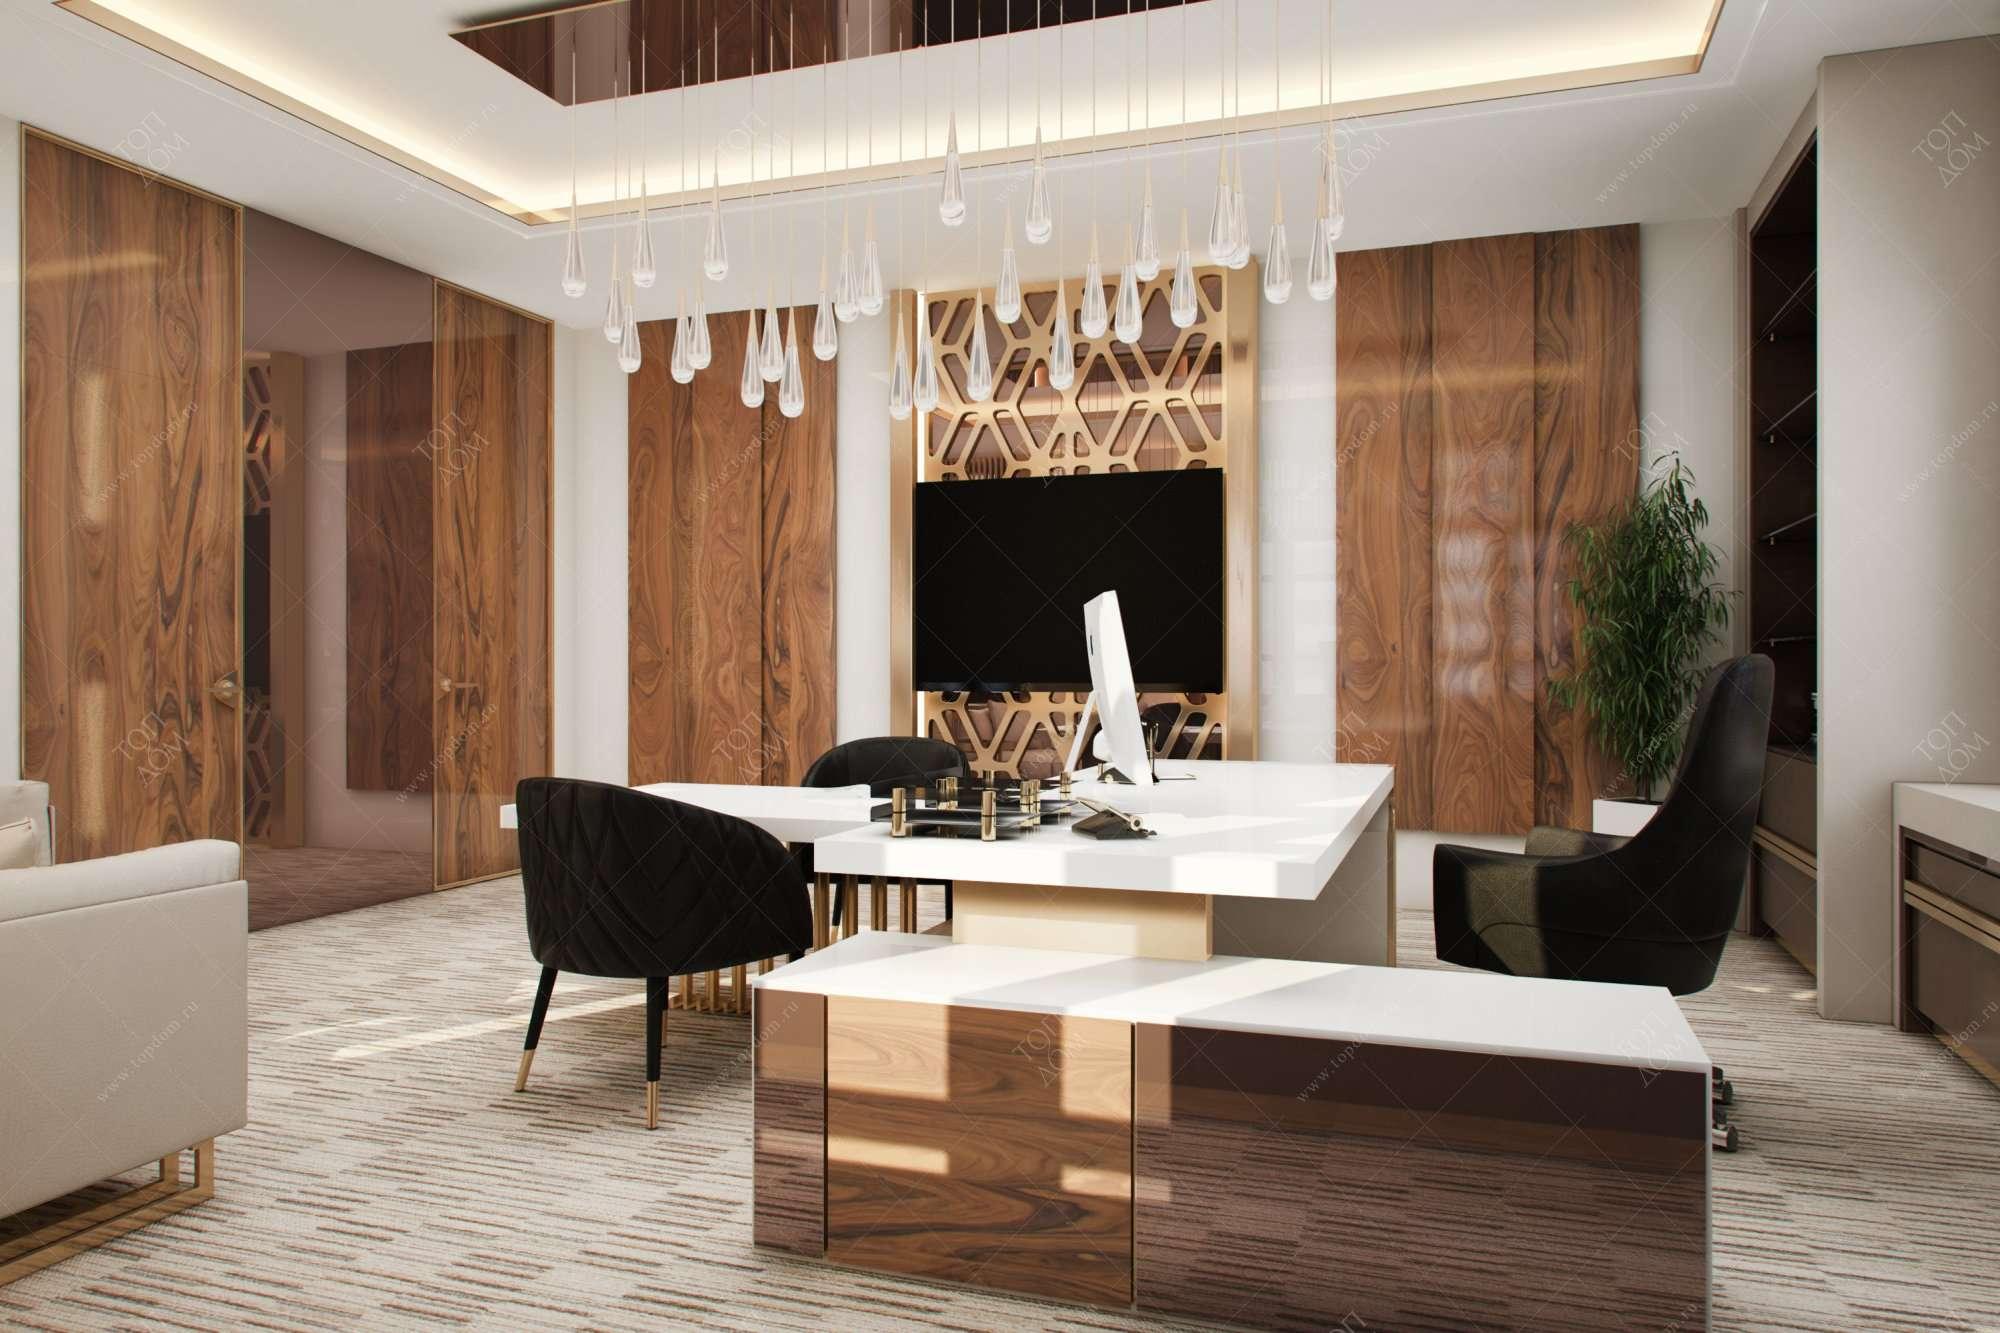 Дизайн зала дизайн зала в маленькой